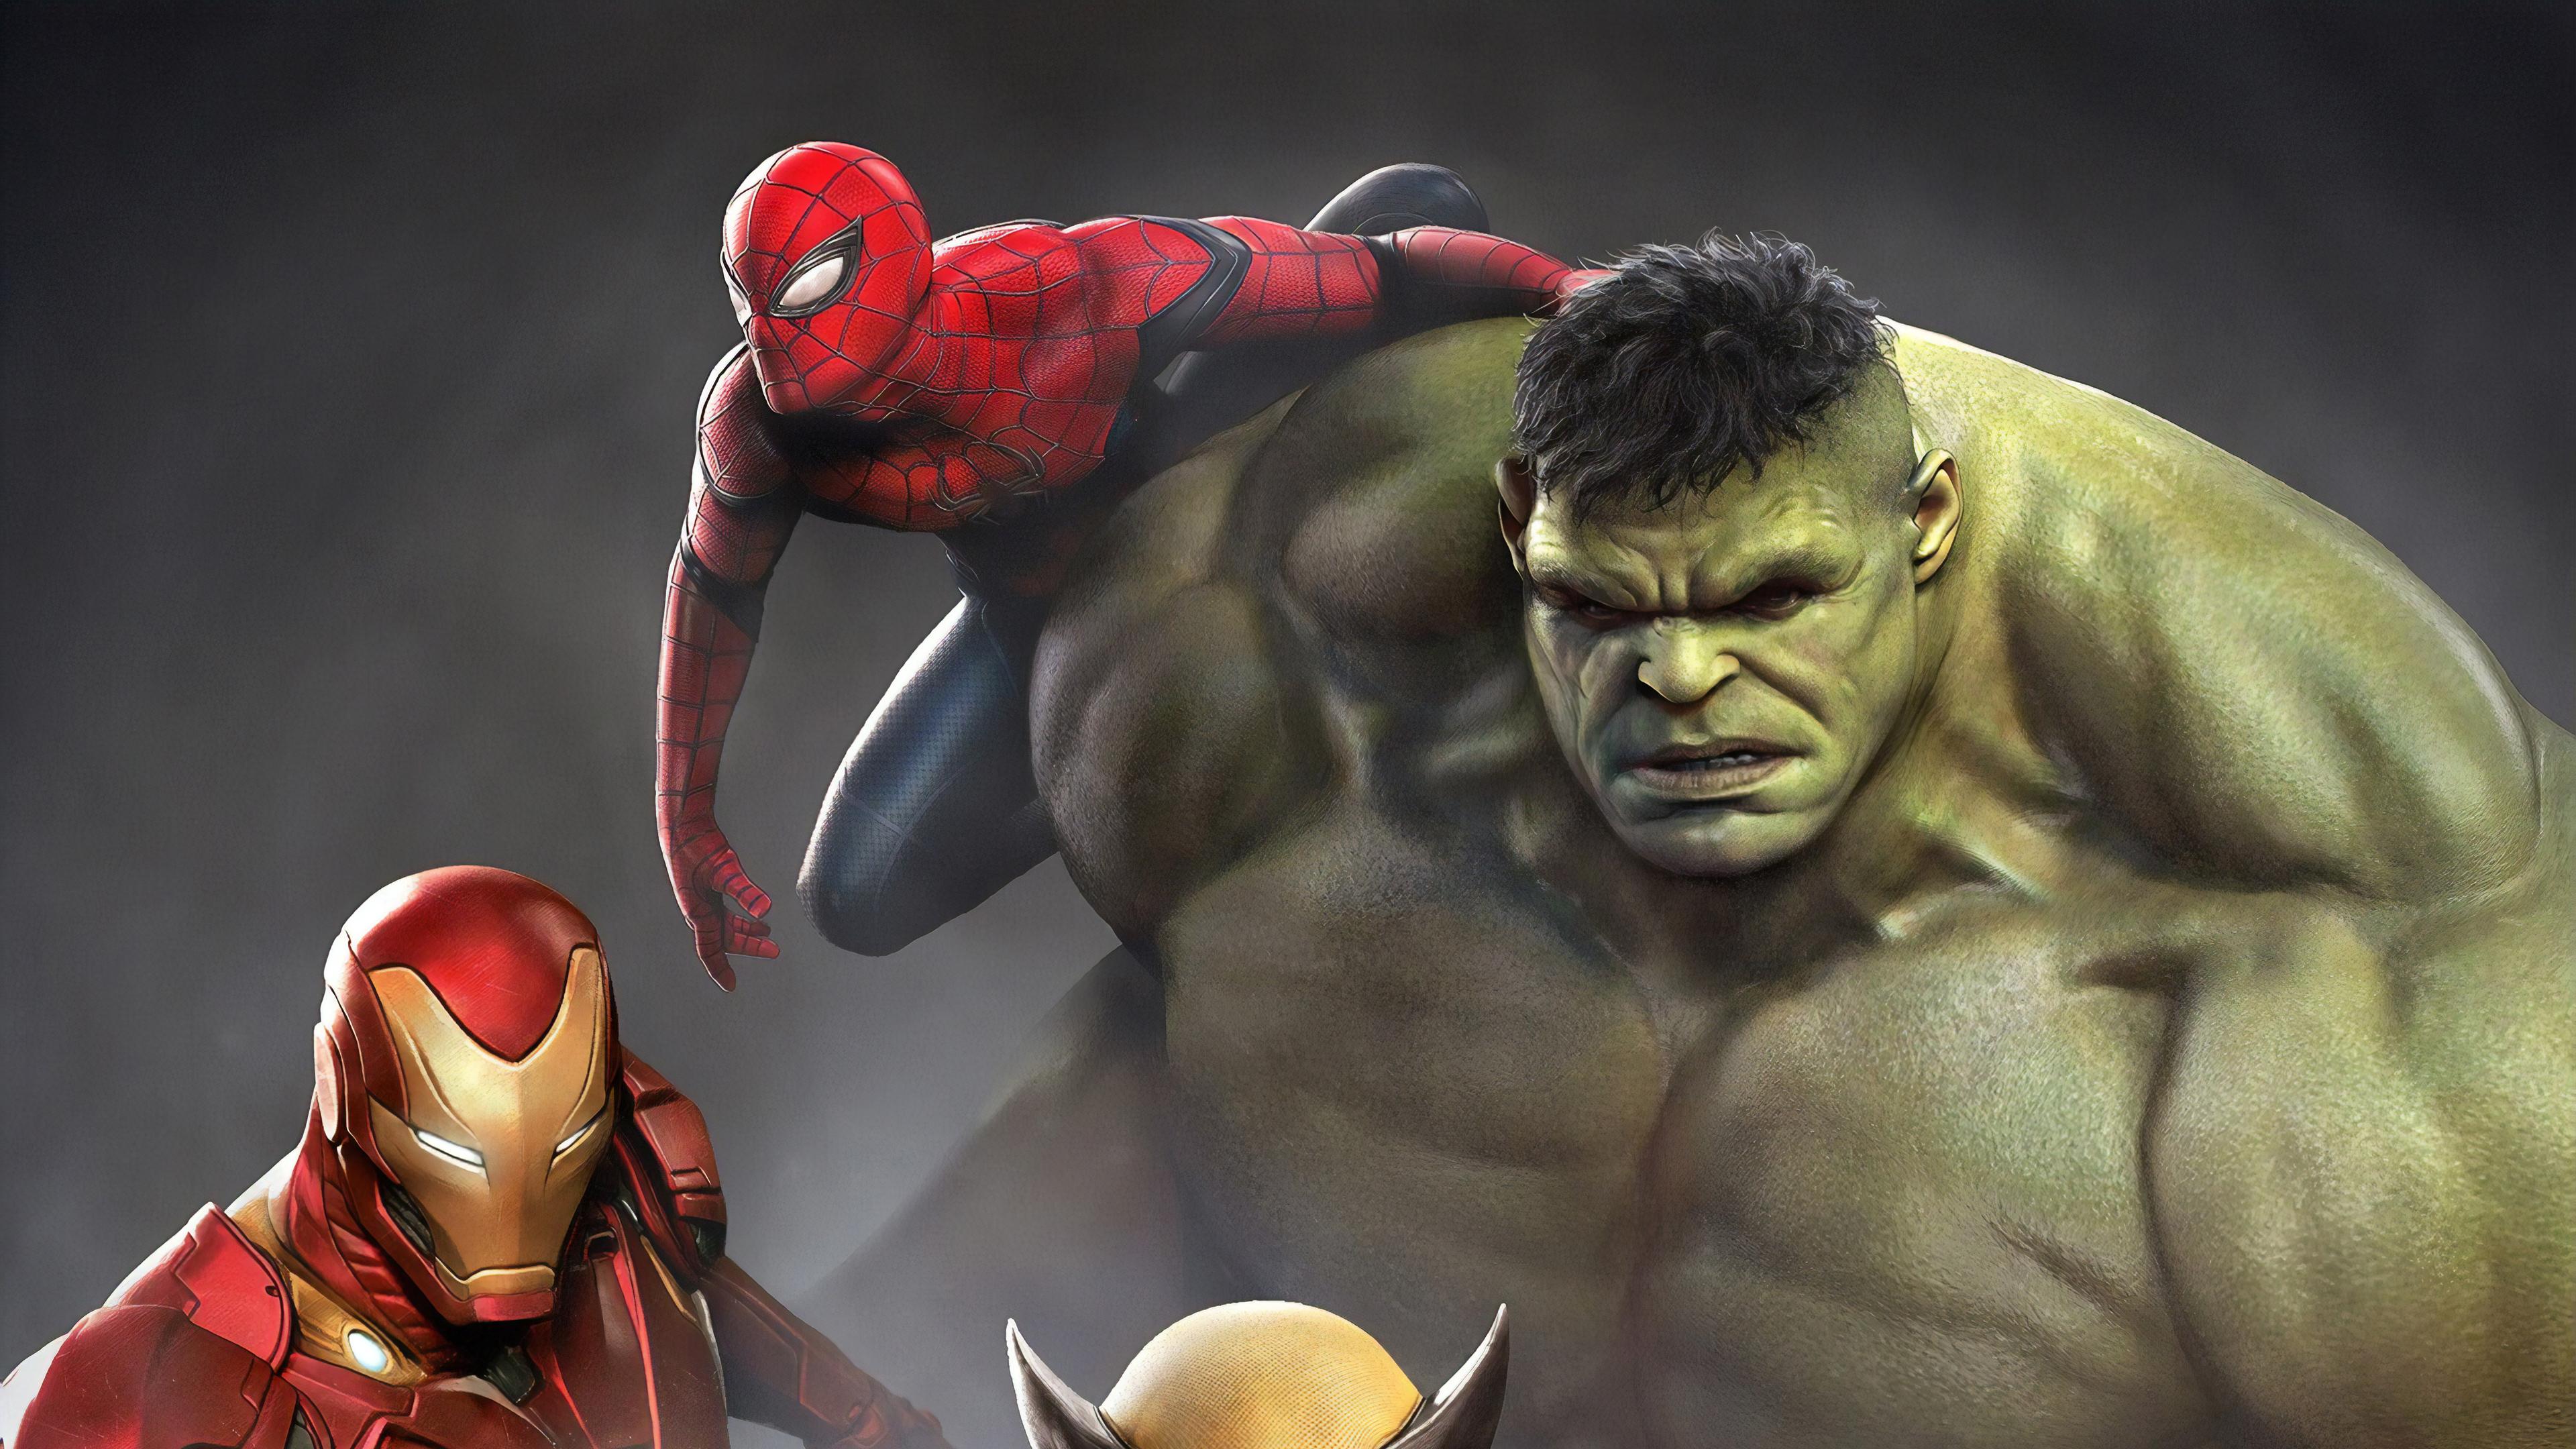 Wallpaper 4k Iron Man Hulk Spiderman Wolverine 4k 4k